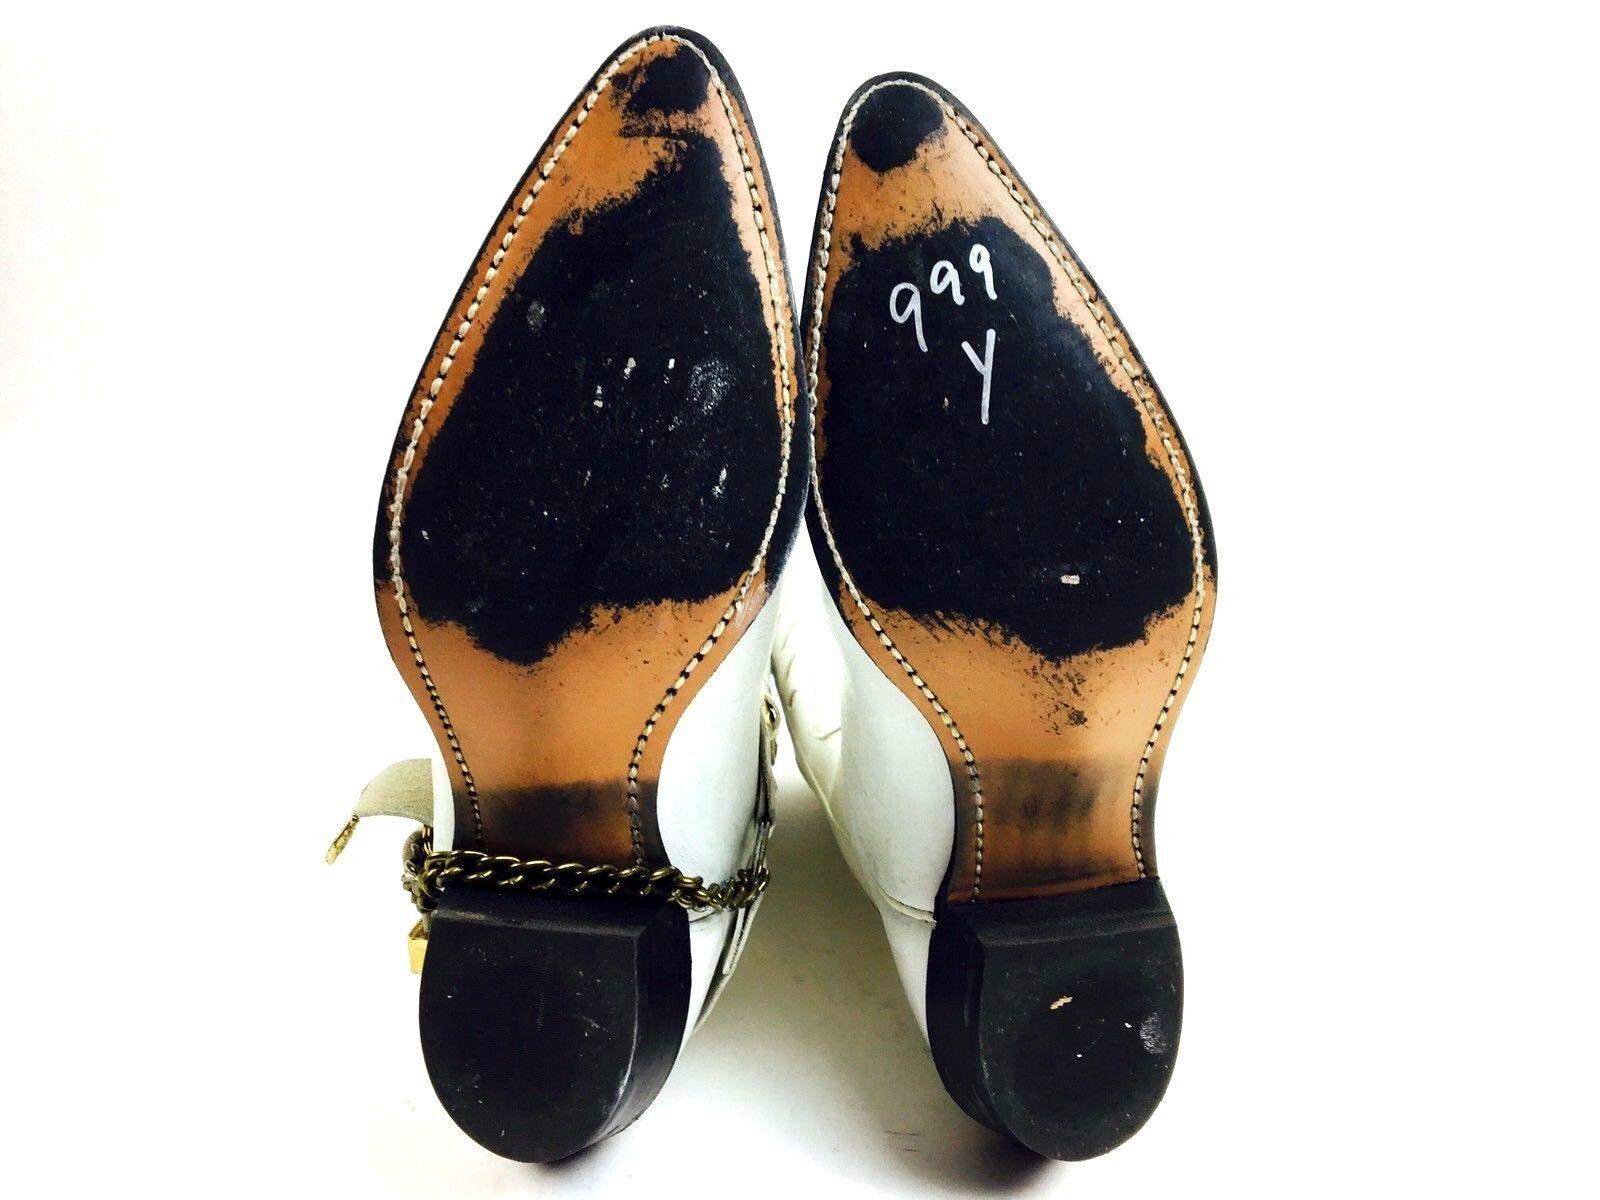 White Cowboy Boots Women's Shoes Women's Boots He… - image 7